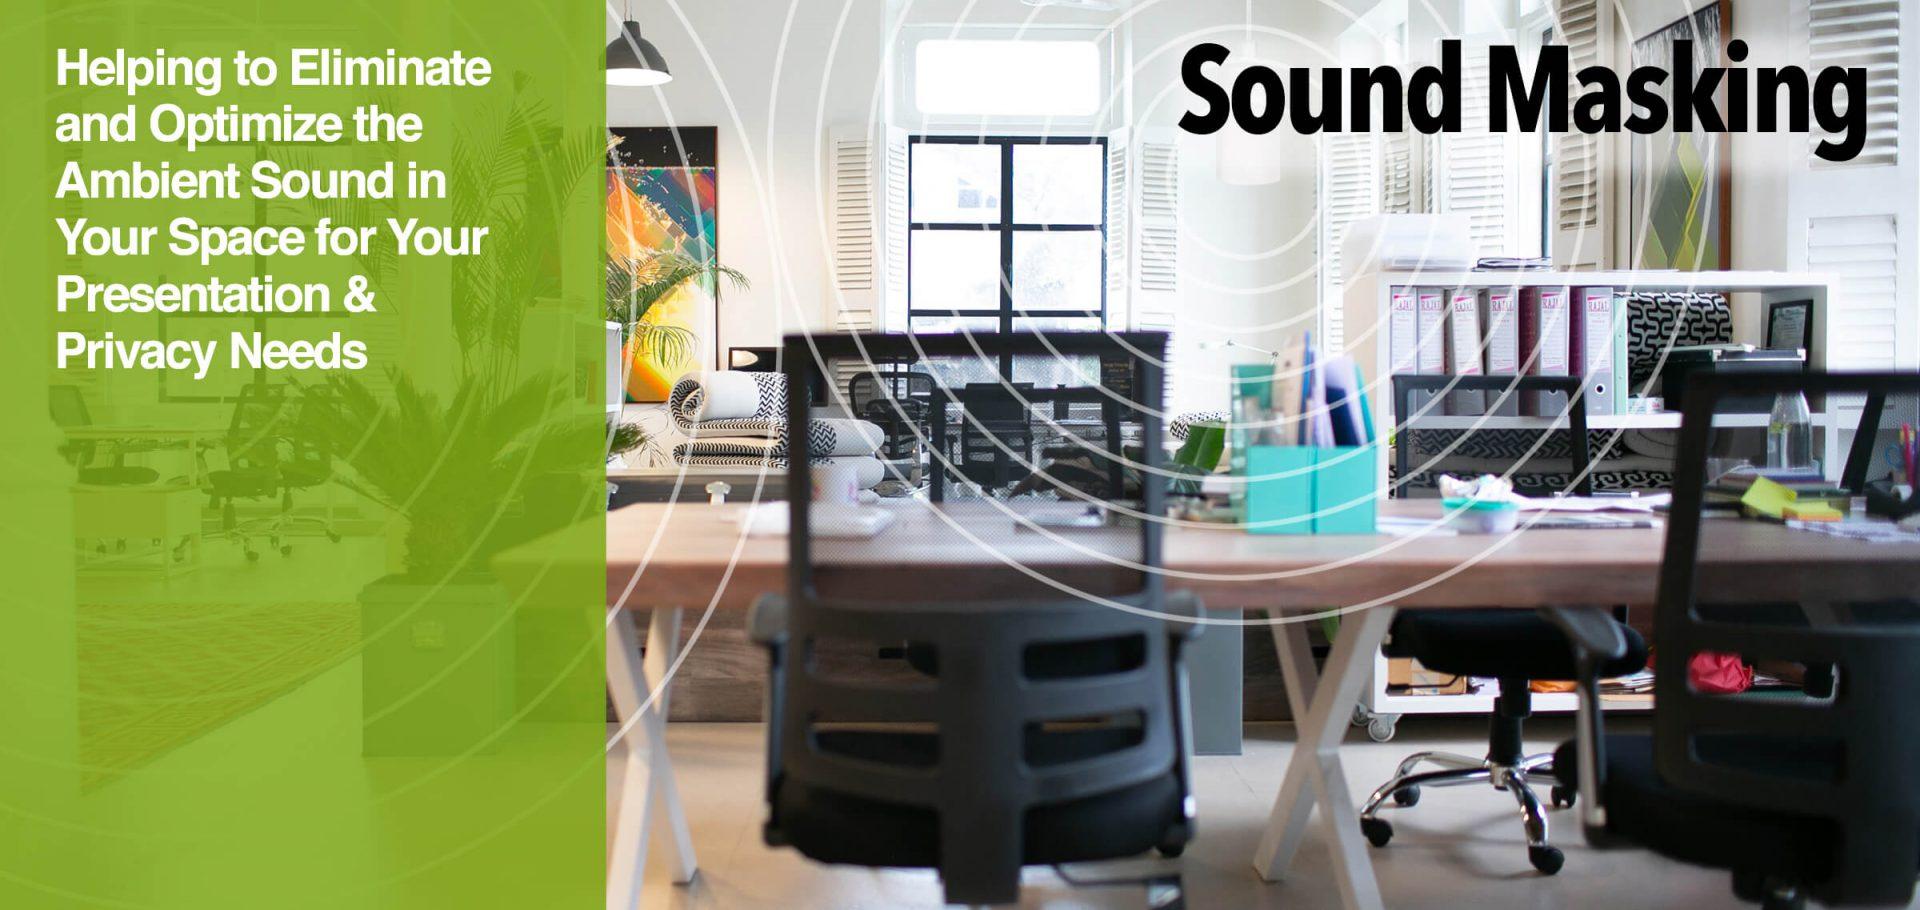 7 -Sound Masking